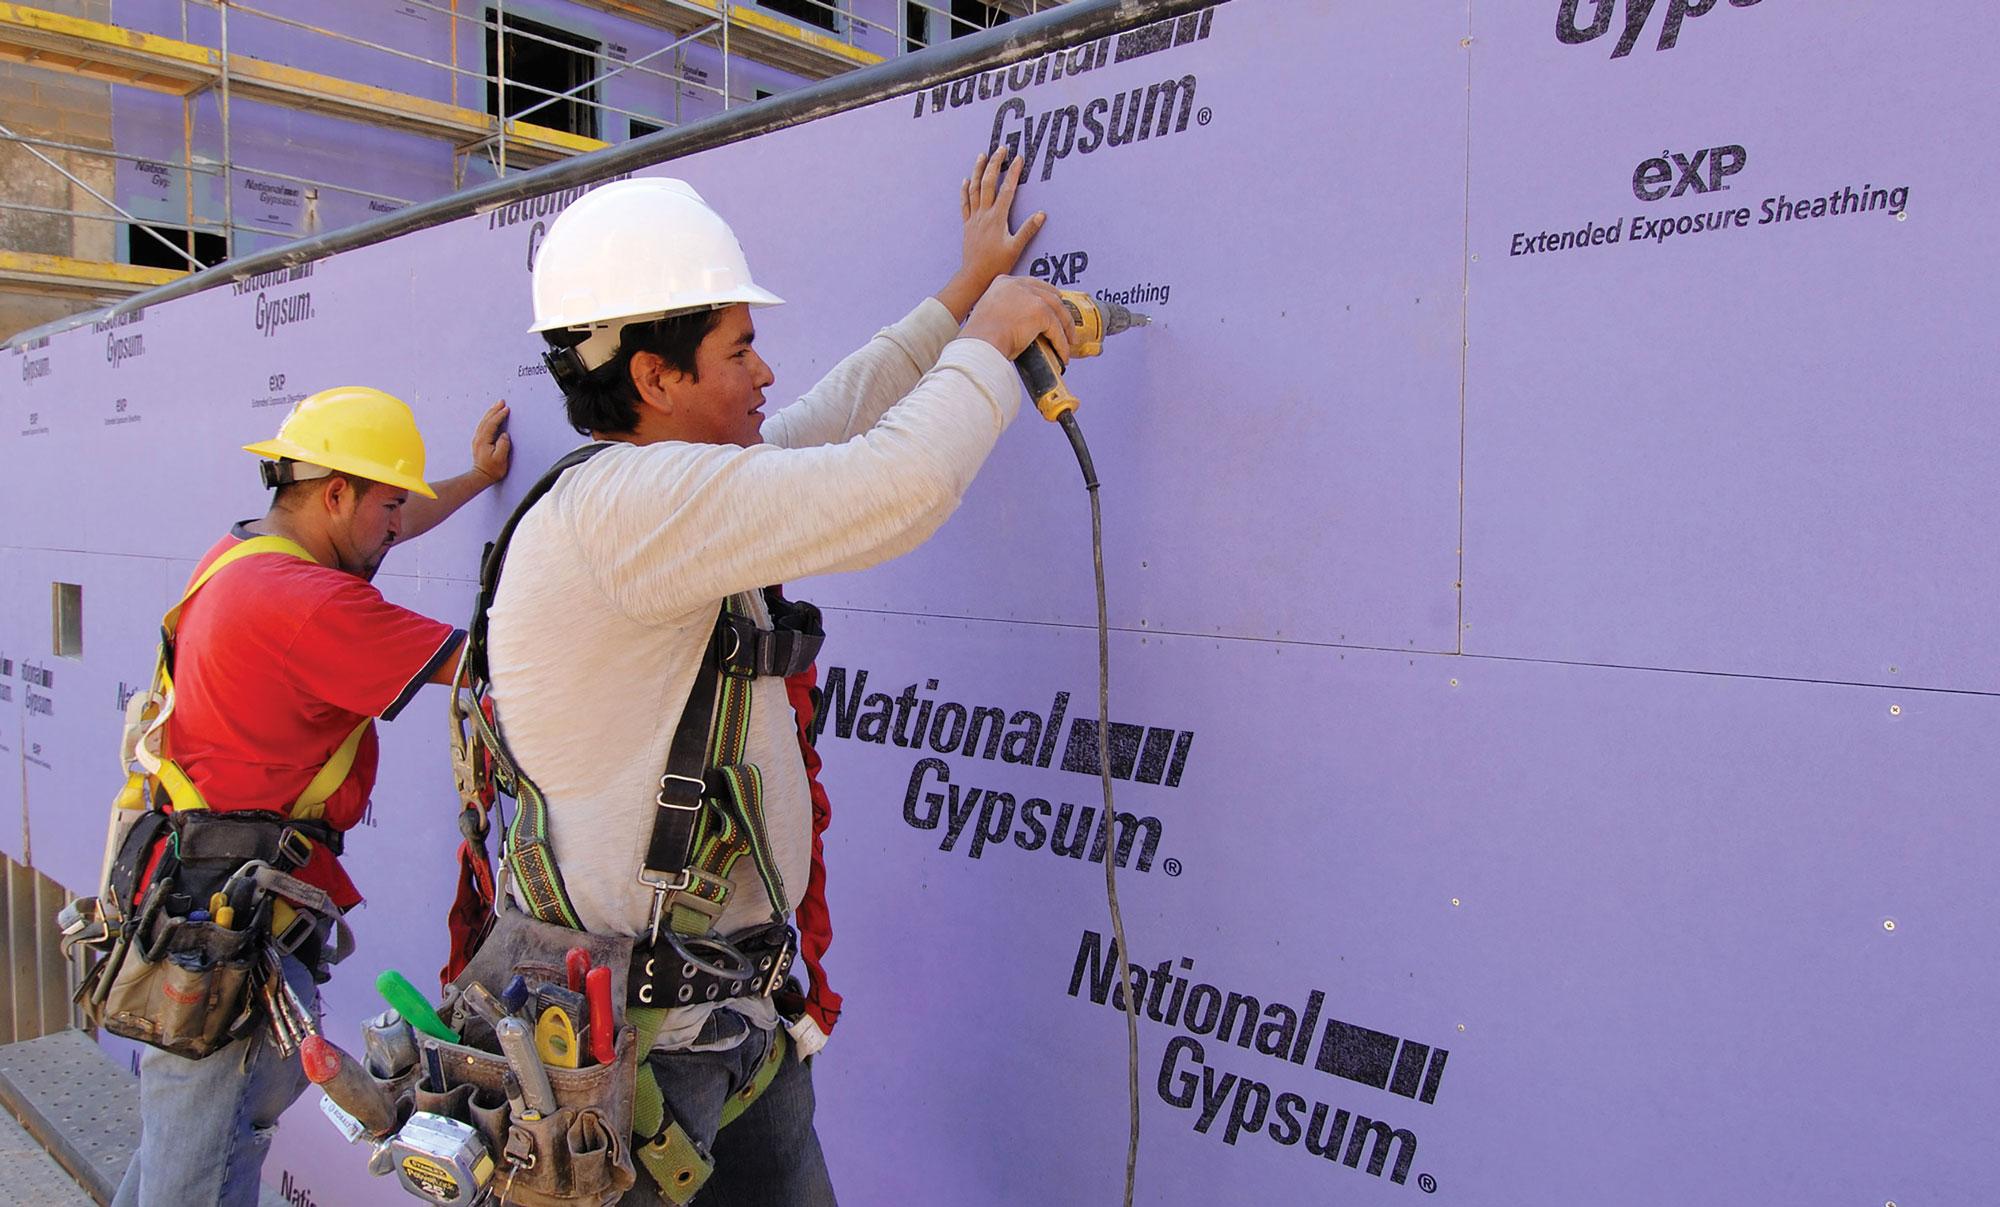 National-Gypsum – Kern Building Materials